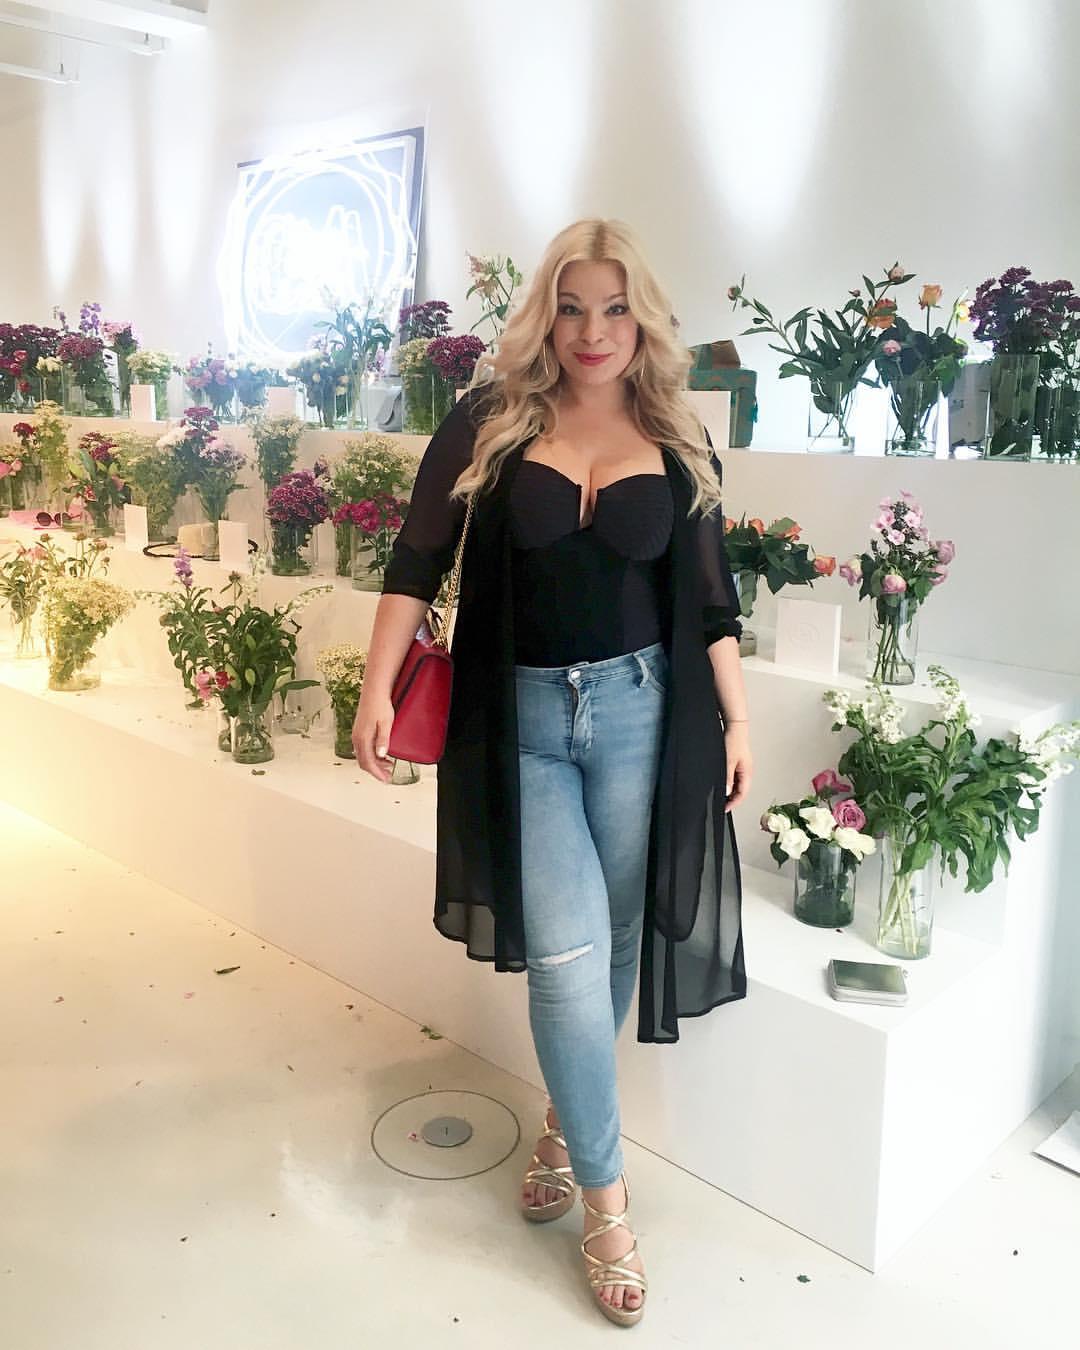 Caterina-pogorzelski-Megabambi-plussize-curvy-Fashionweek-Berlin